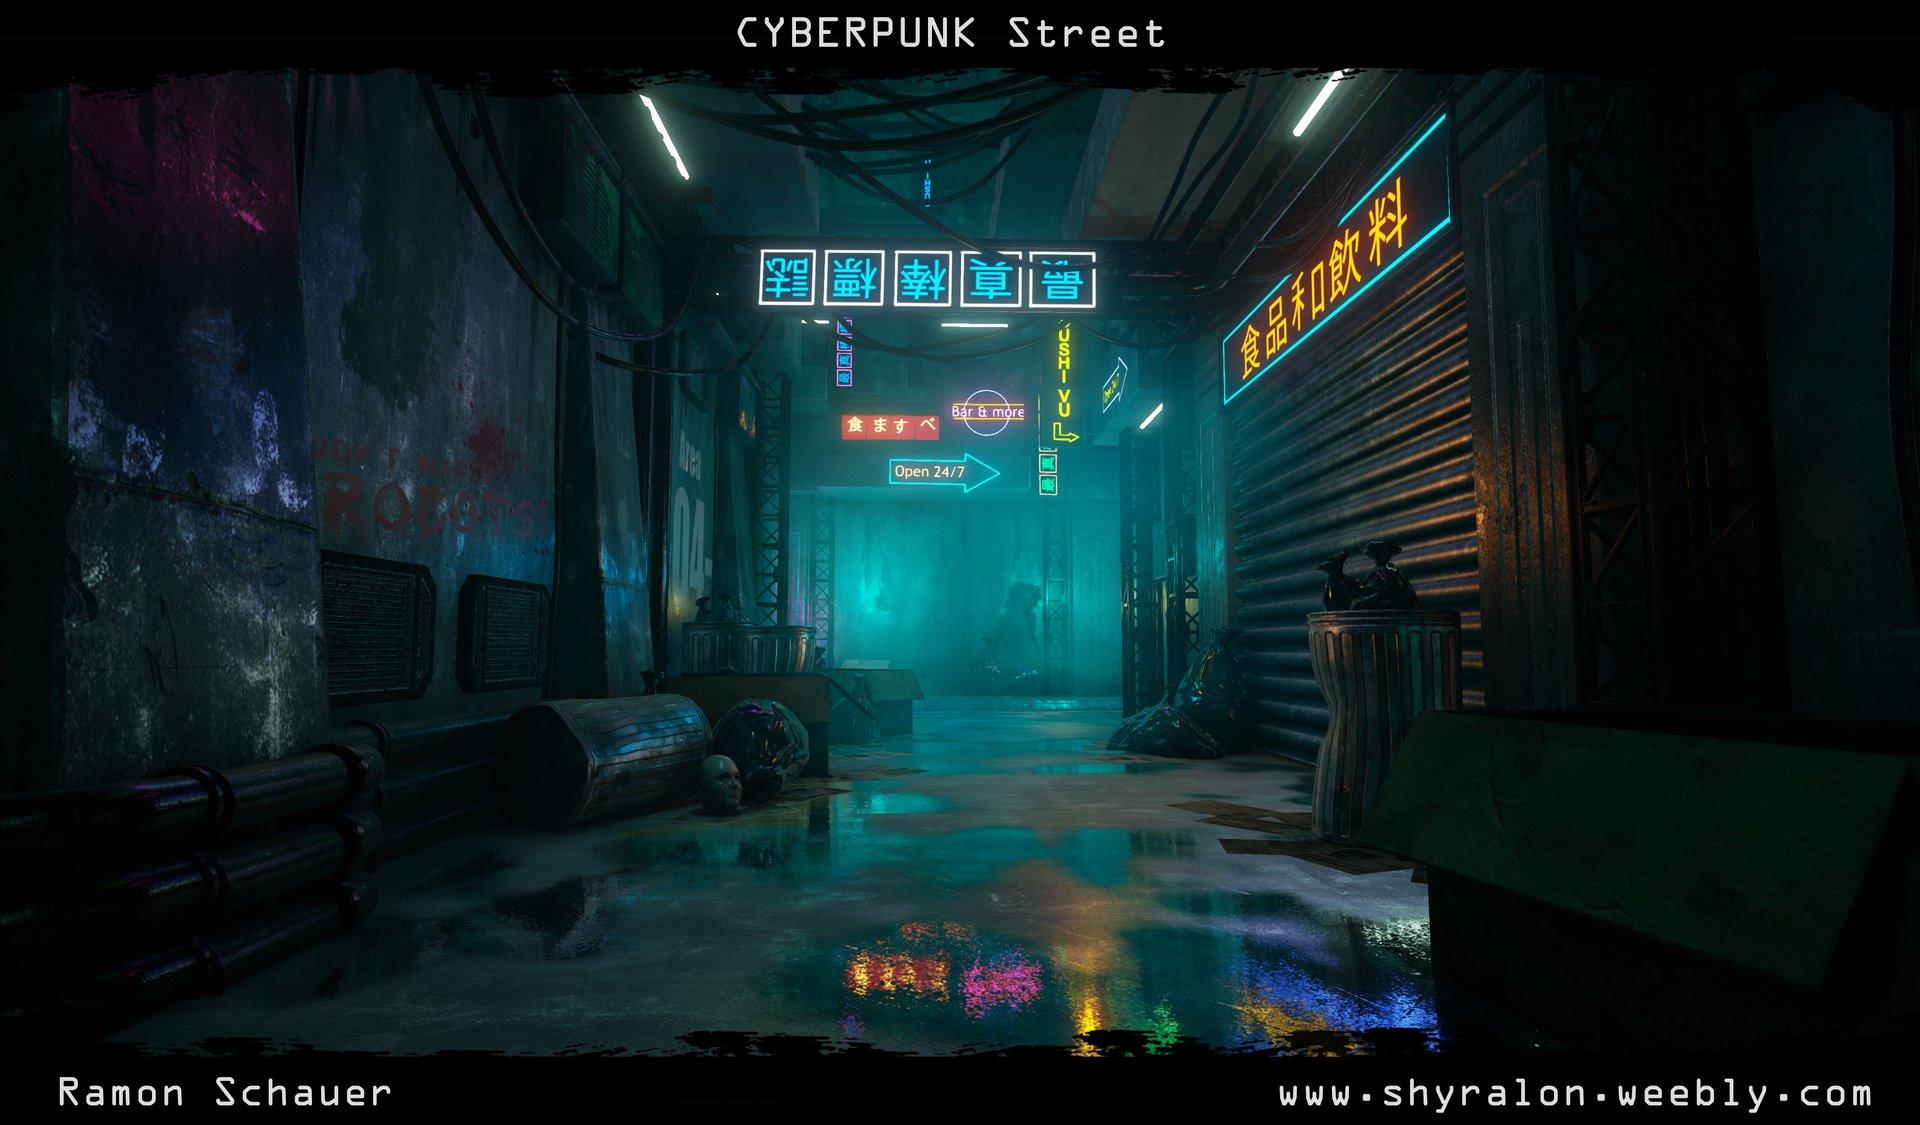 Online Building Plan Cyberpunk Street Unreal Engine 4 Polycount